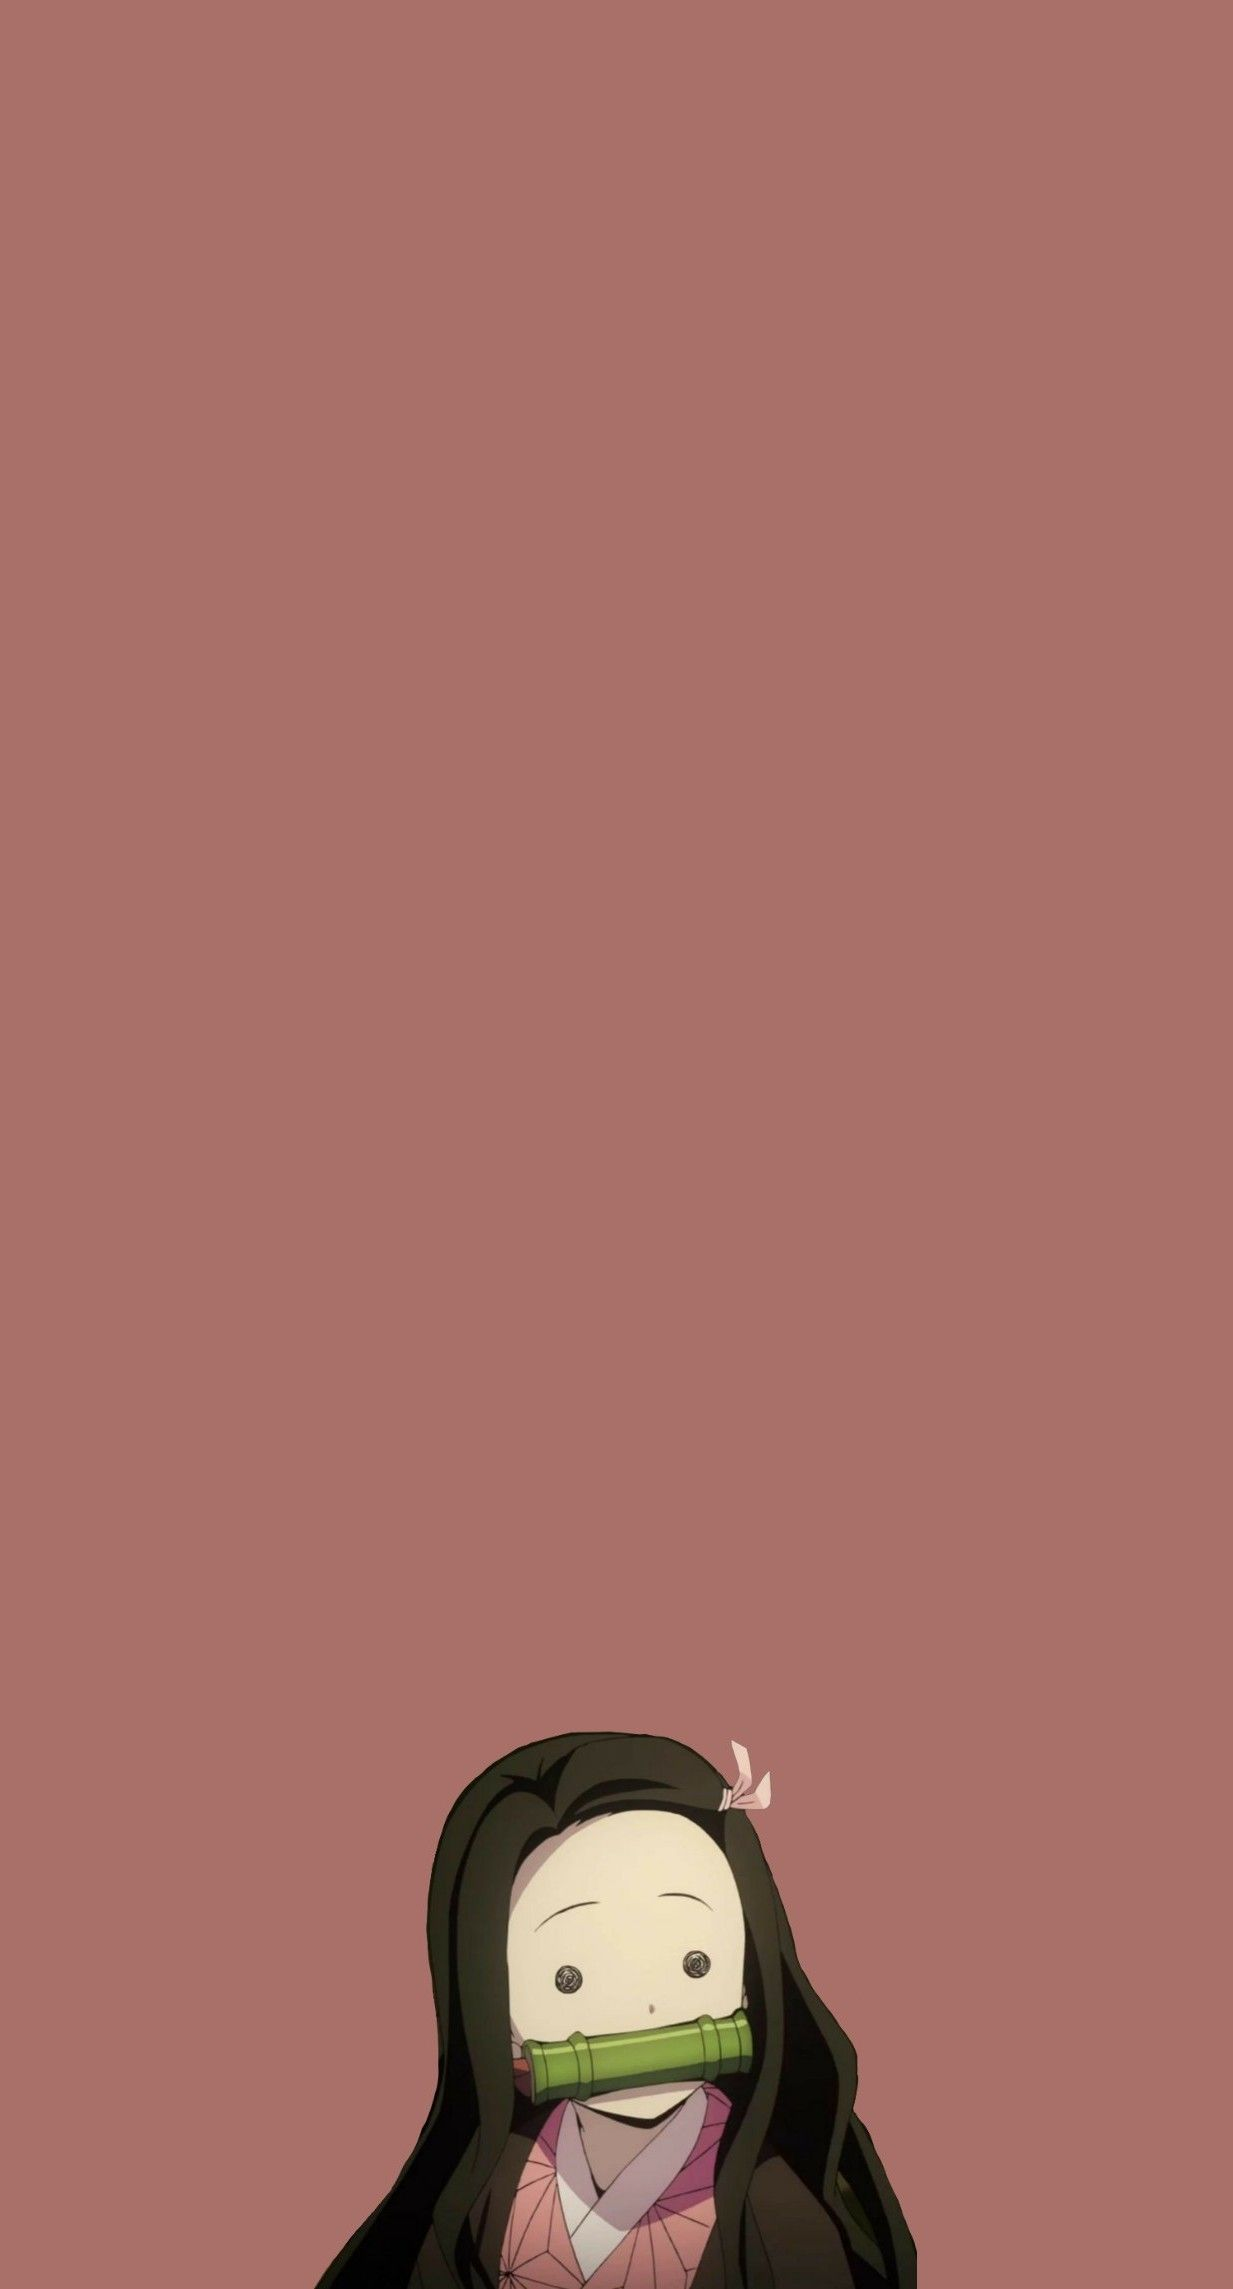 Nezuko Kamado Anime Demon Anime Wallpaper Cute Anime Wallpaper